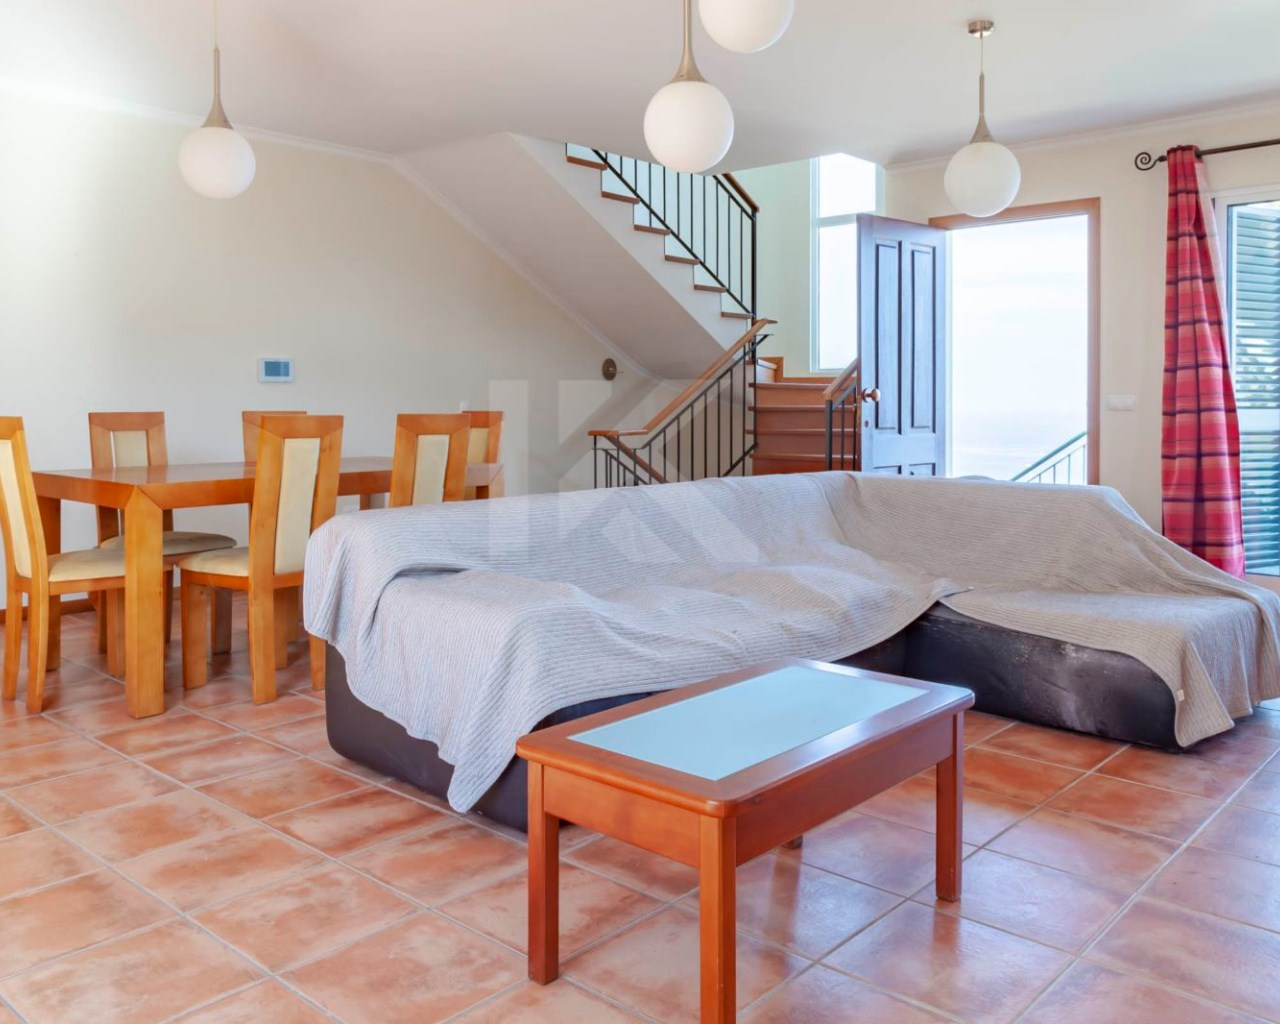 Maison 3 Chambres Jumelees Santa Cruz Gaula Imokantus Ik608 Sc